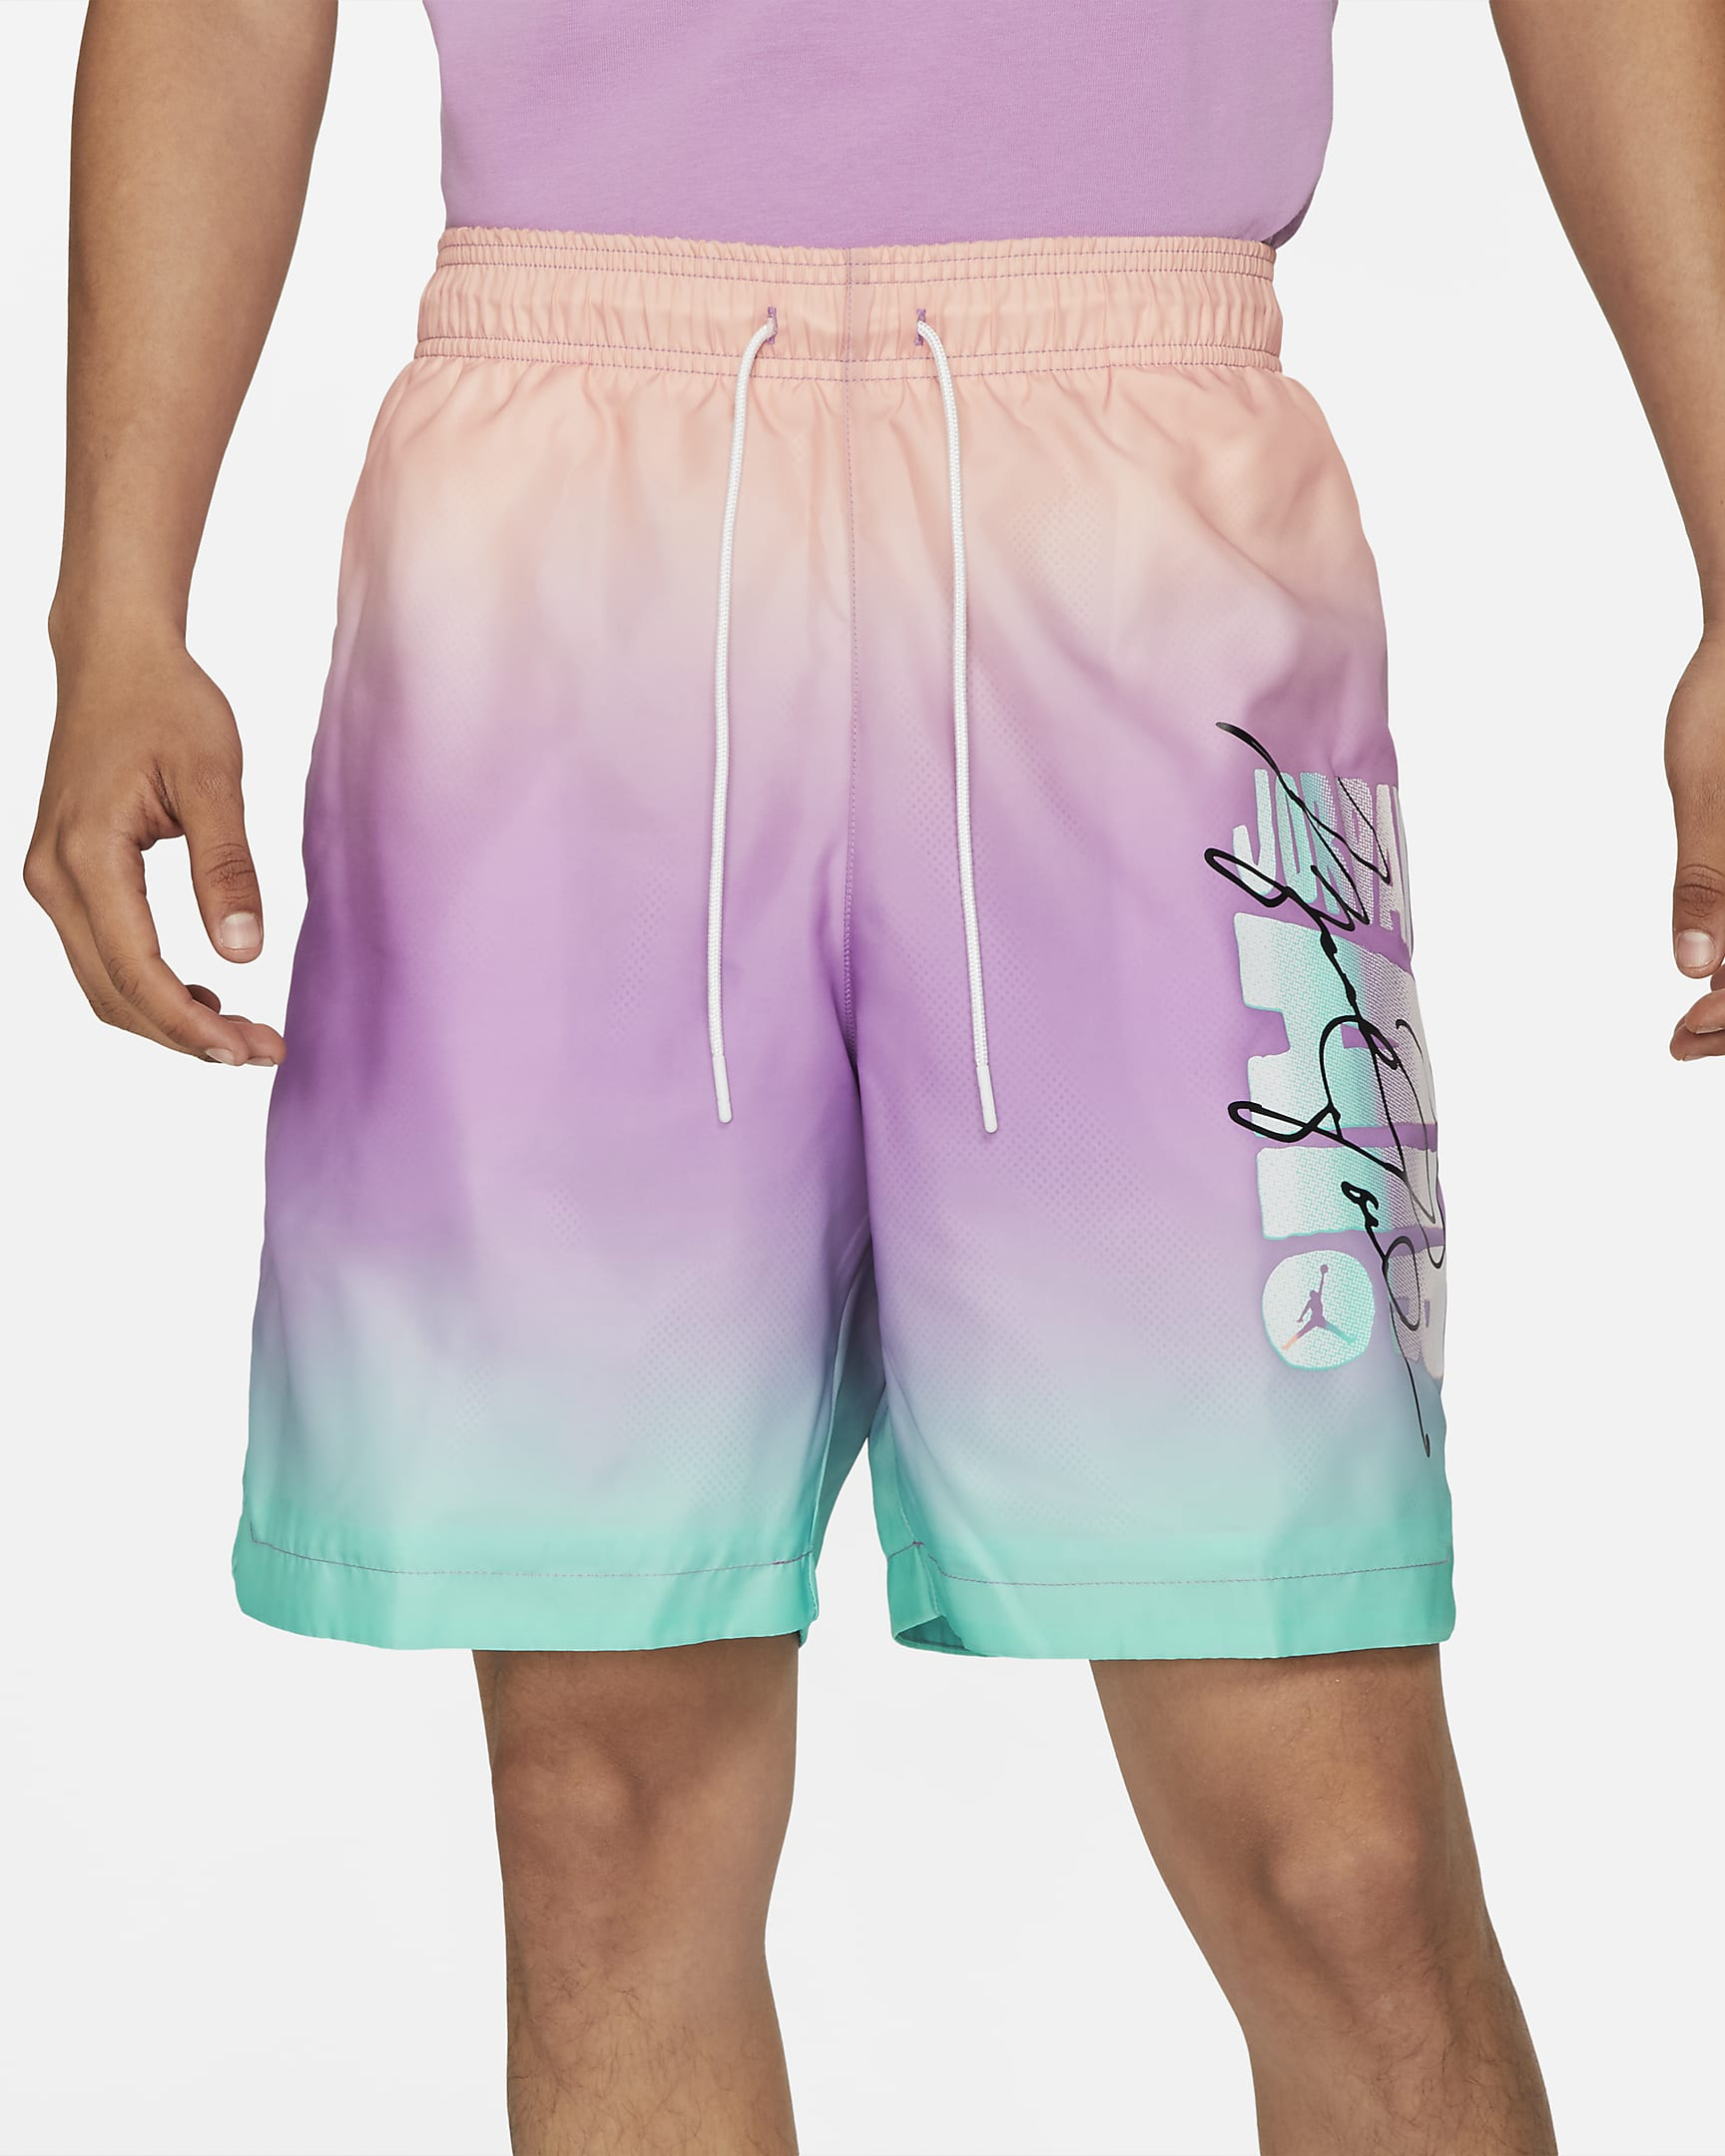 jordan-sport-dna-mens-pool-shorts-MklHwc-2.png